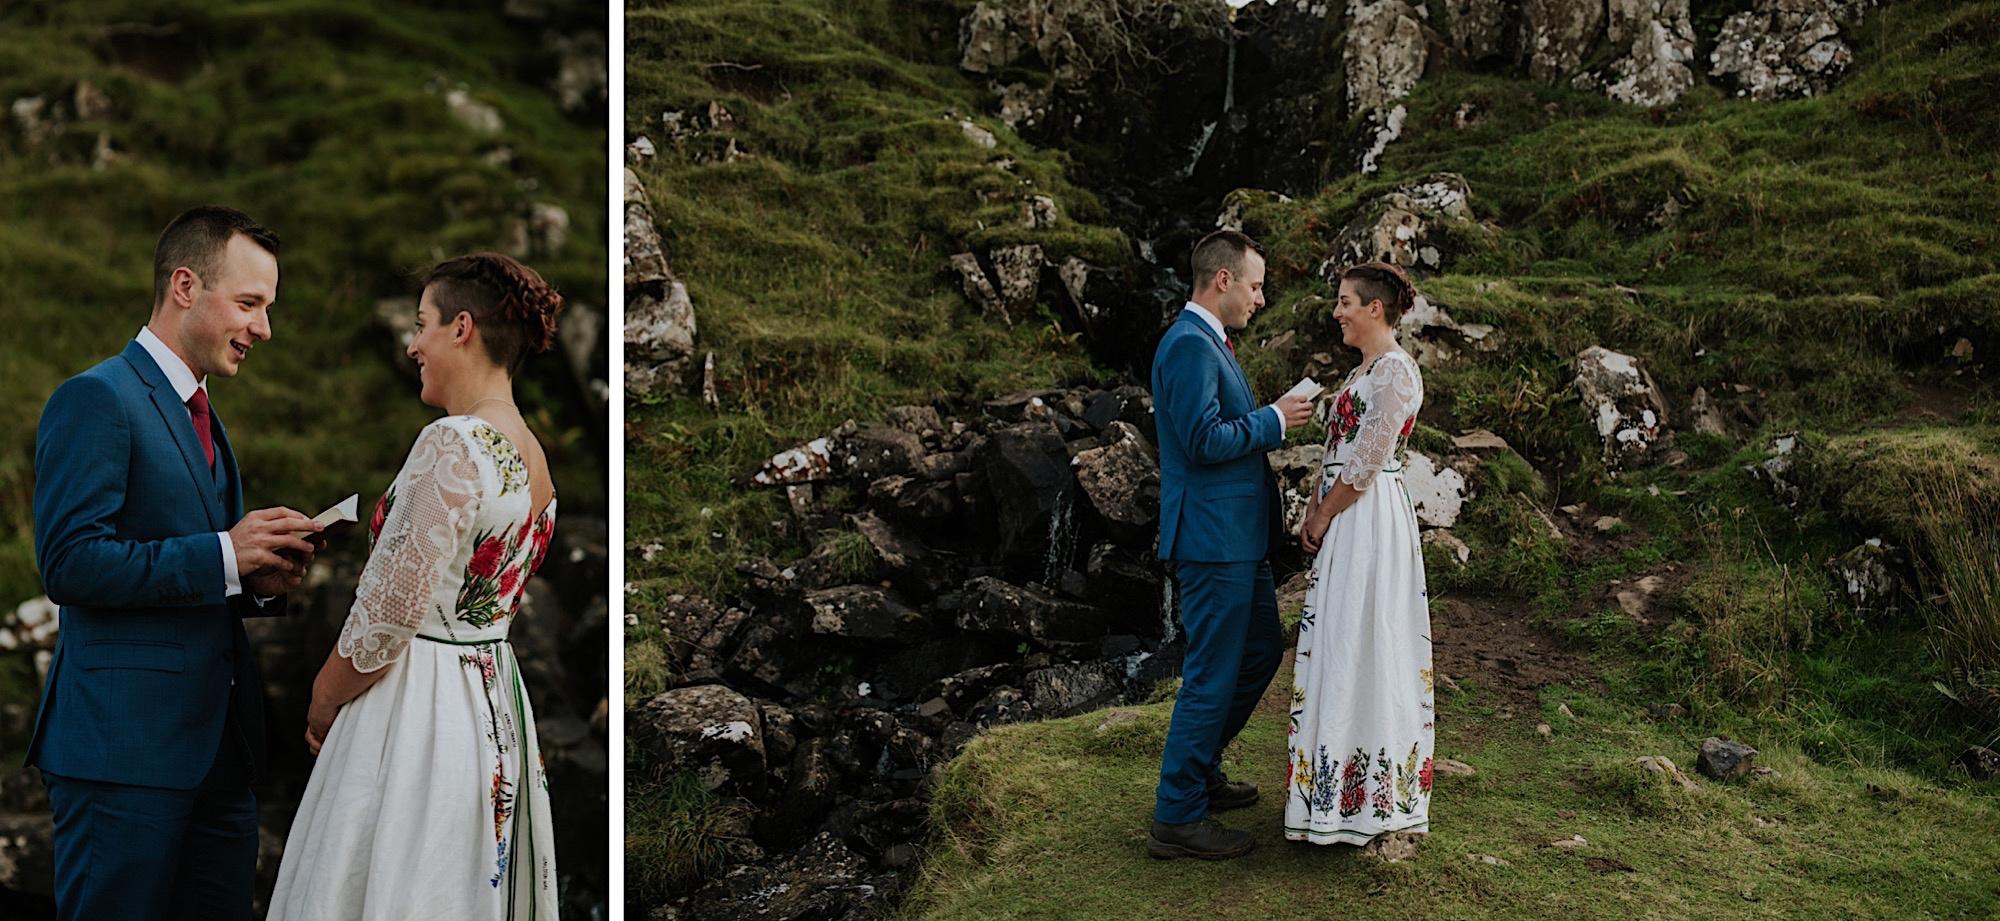 fairy glen elopement photographer